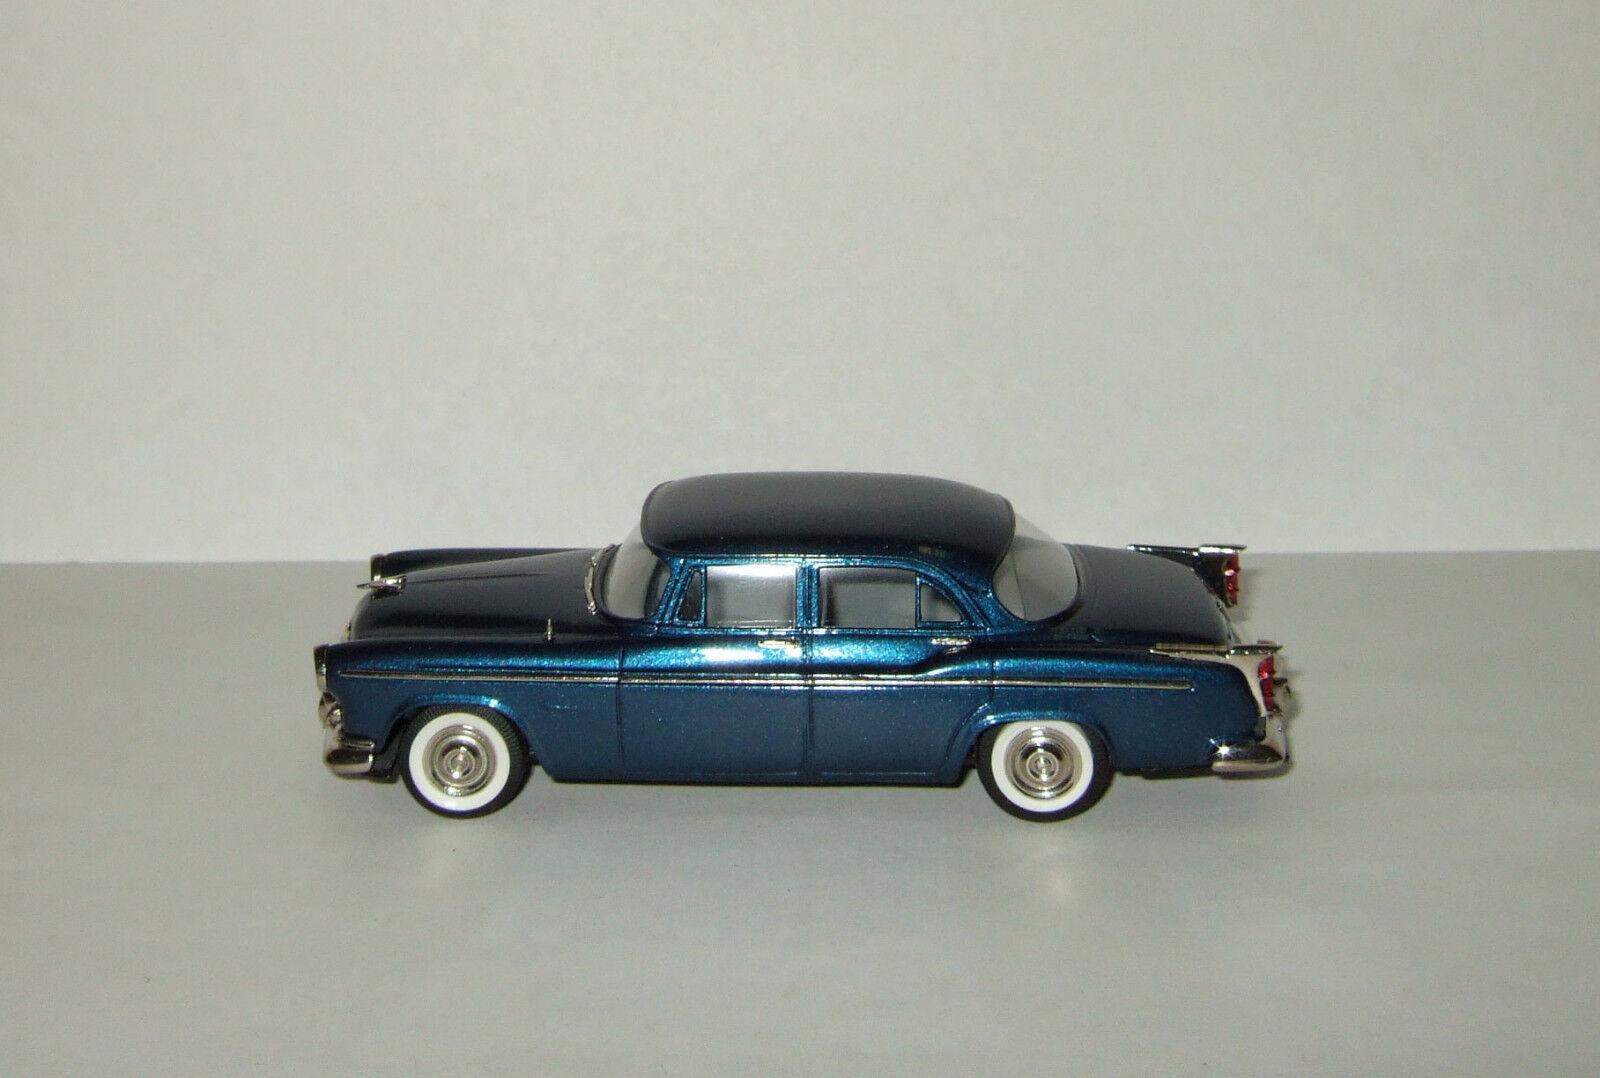 Limousine Limousine Limousine Chrysler Windsor 1955 Brooklin Models 1 43 c64361